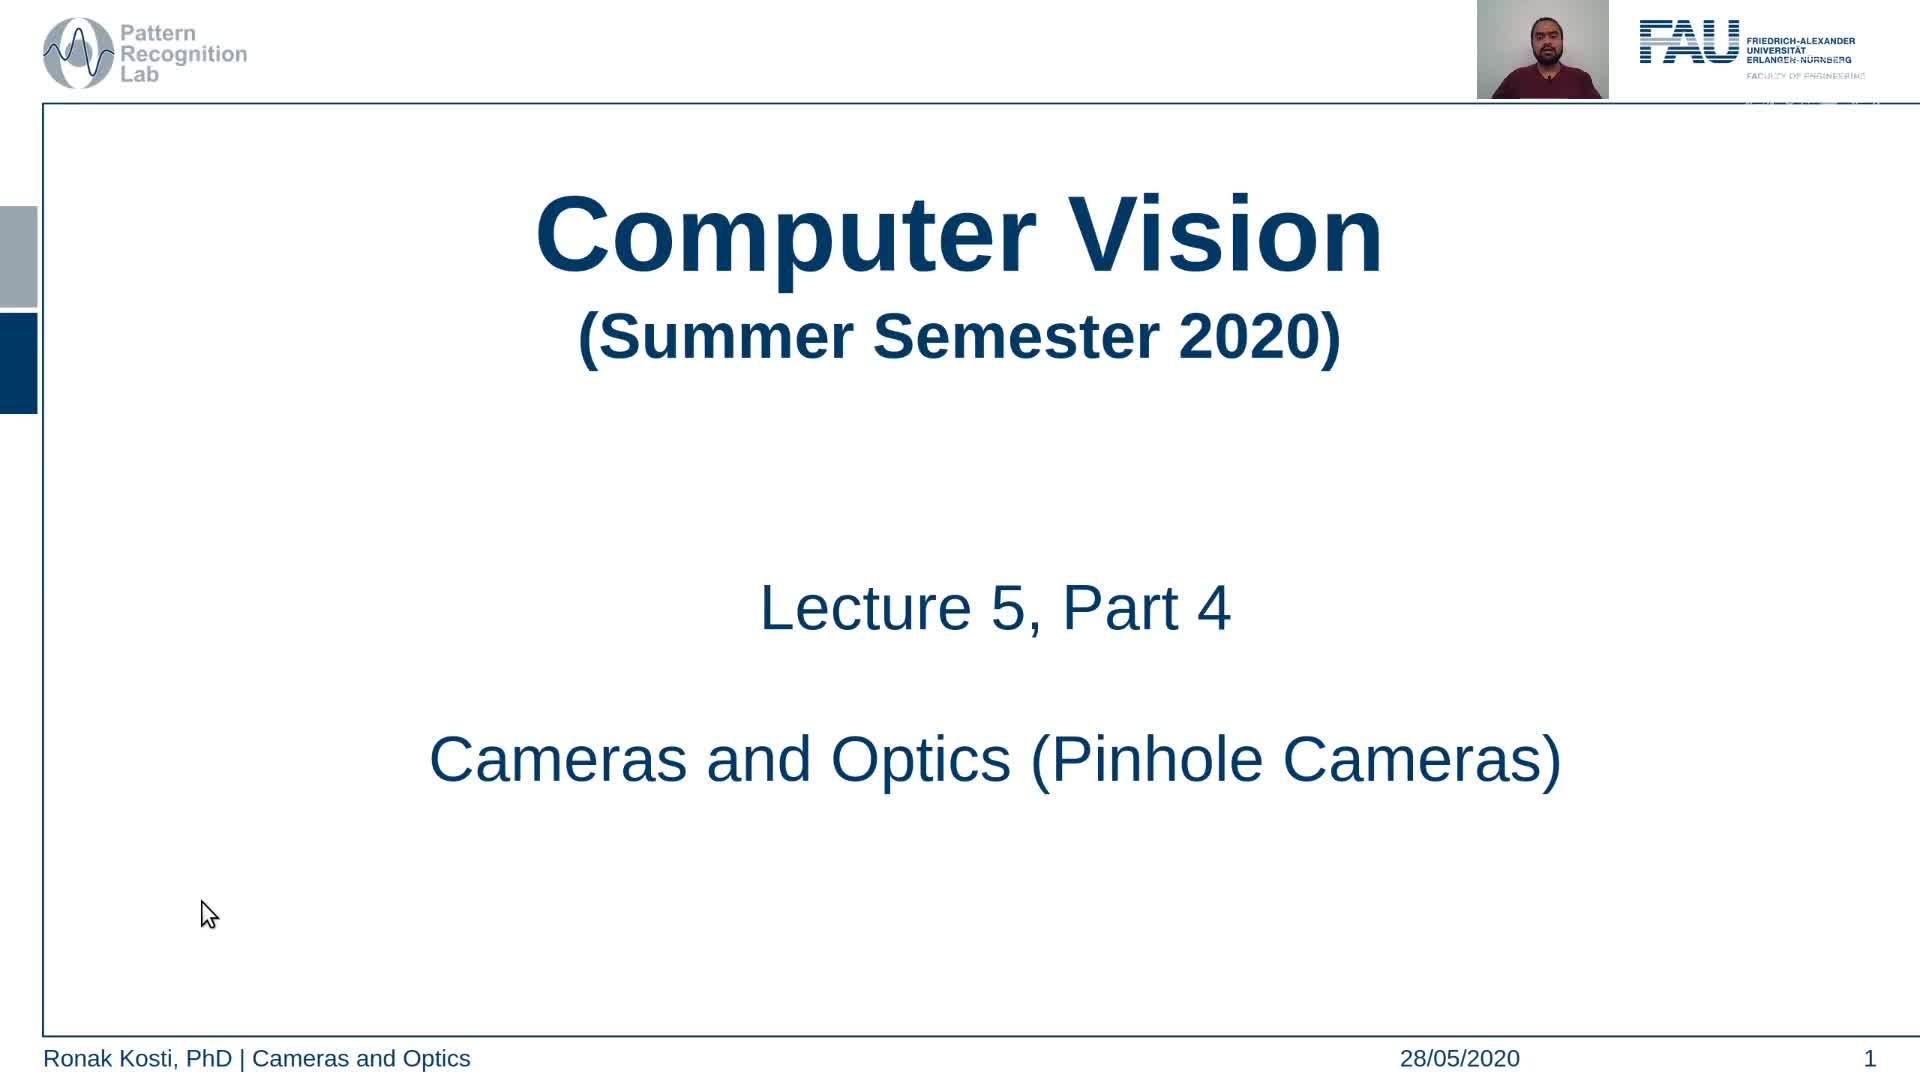 Cameras and Optics - Pinhole Cameras (Lecture 5, Part 4) preview image